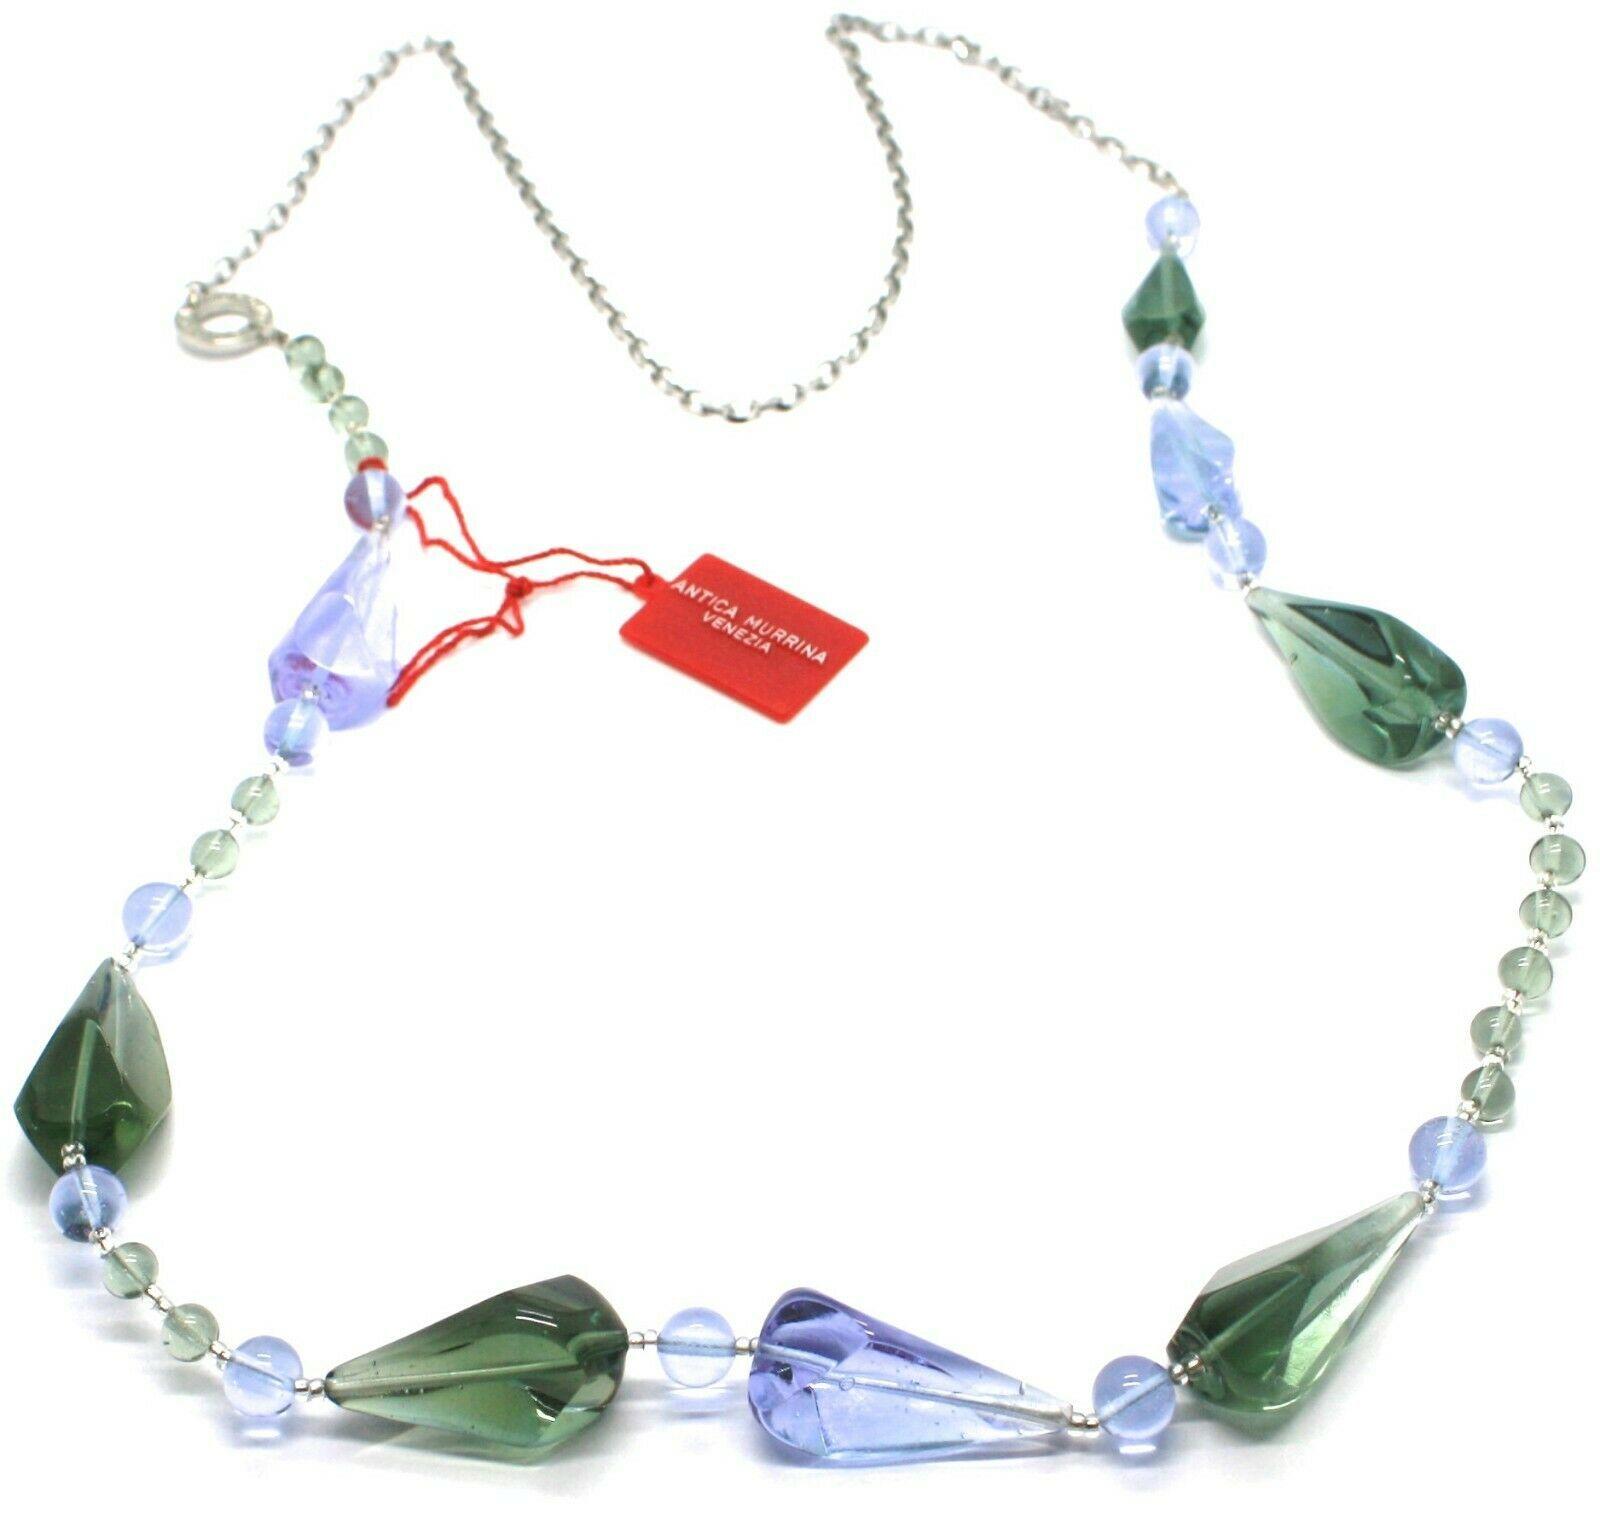 Necklace Antica Murrina Venezia, Glass Murano, 90 cm, CO561A12, Drops Blue Green